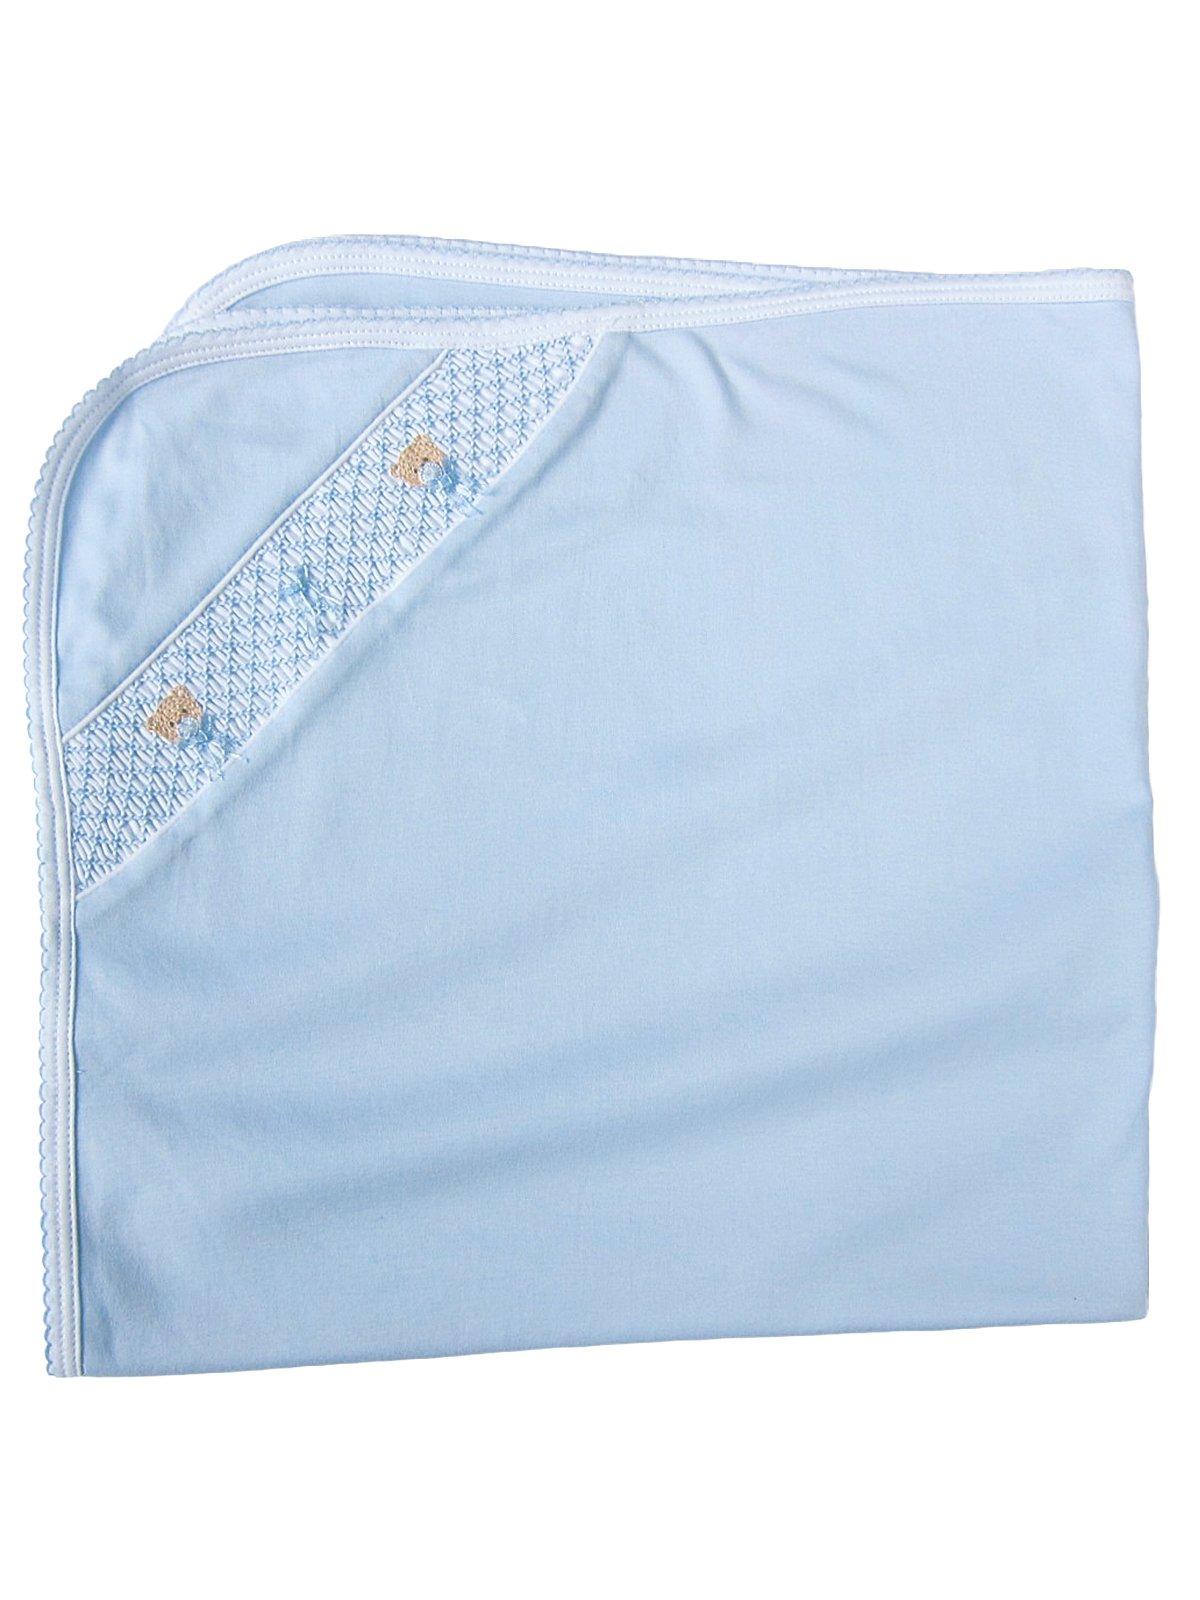 453b33490 Smocked Baby Blankets - Luxury Blankets - Luxury Bedding - Italian ...